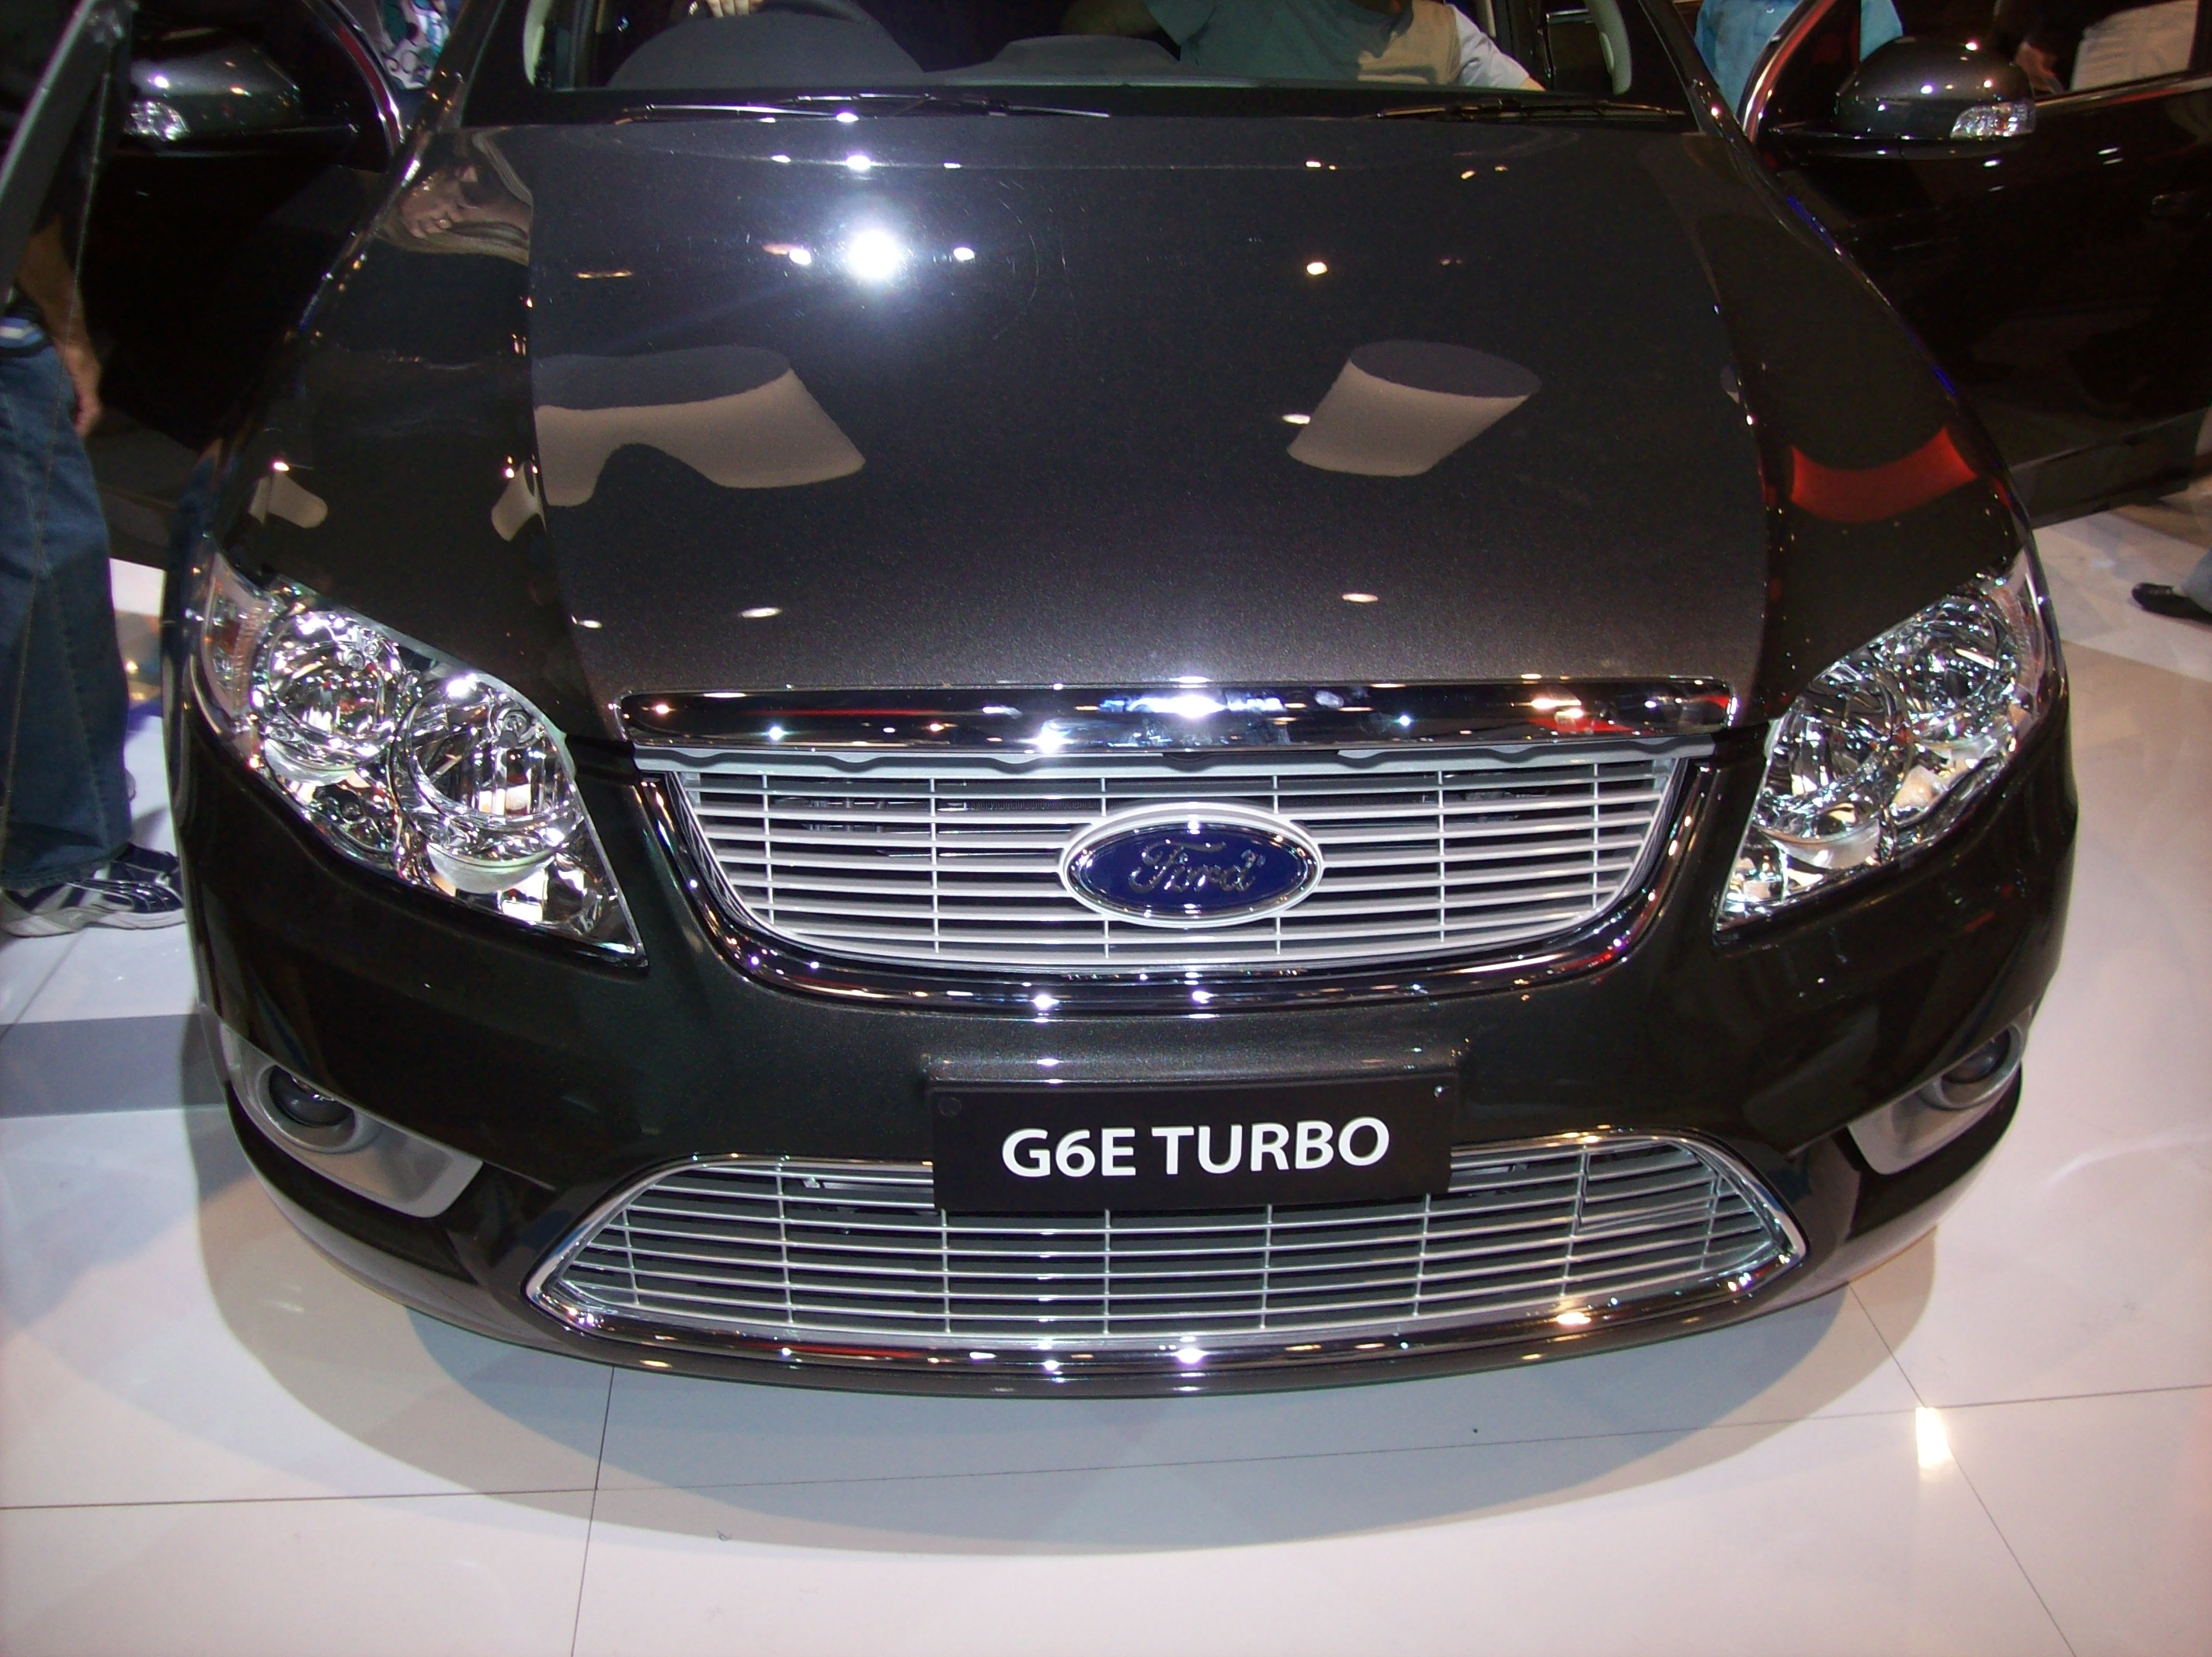 File2008 Ford FG G6E Turbo sedan 04jpg  Wikimedia Commons